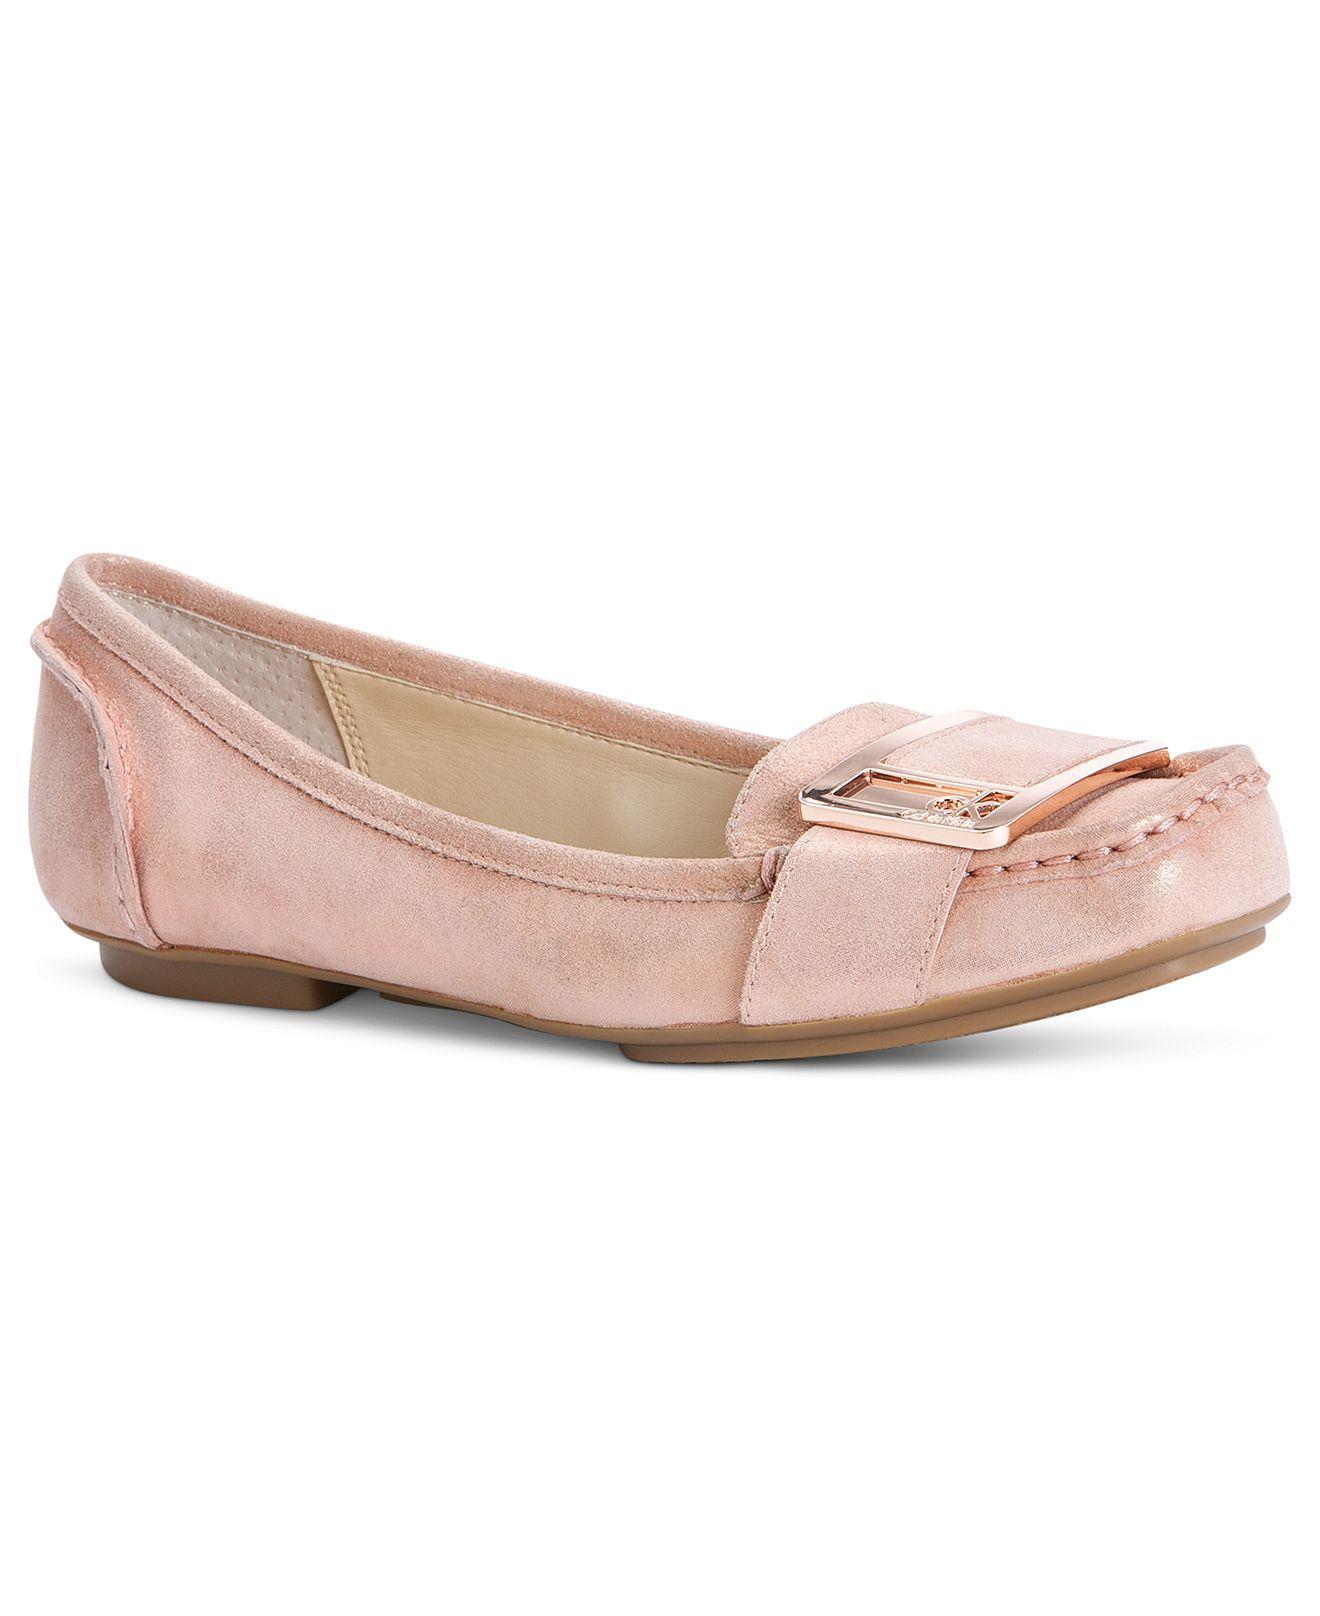 34caad19dabf Calvin Klein Women s Shoes